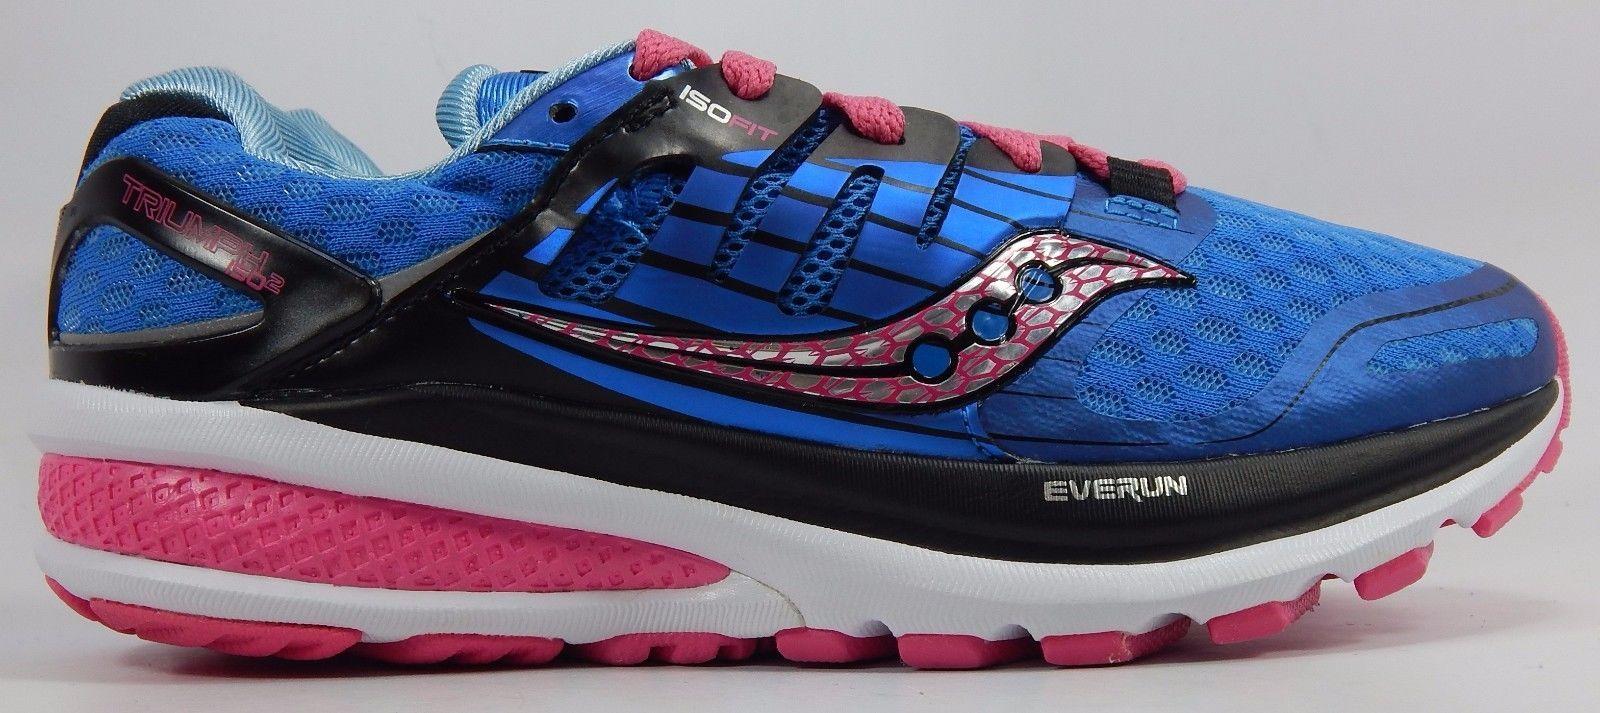 Saucony Triumph ISO 2 Women's Running Shoes Size US 7 M (B) EU 38 Blue S10290-2